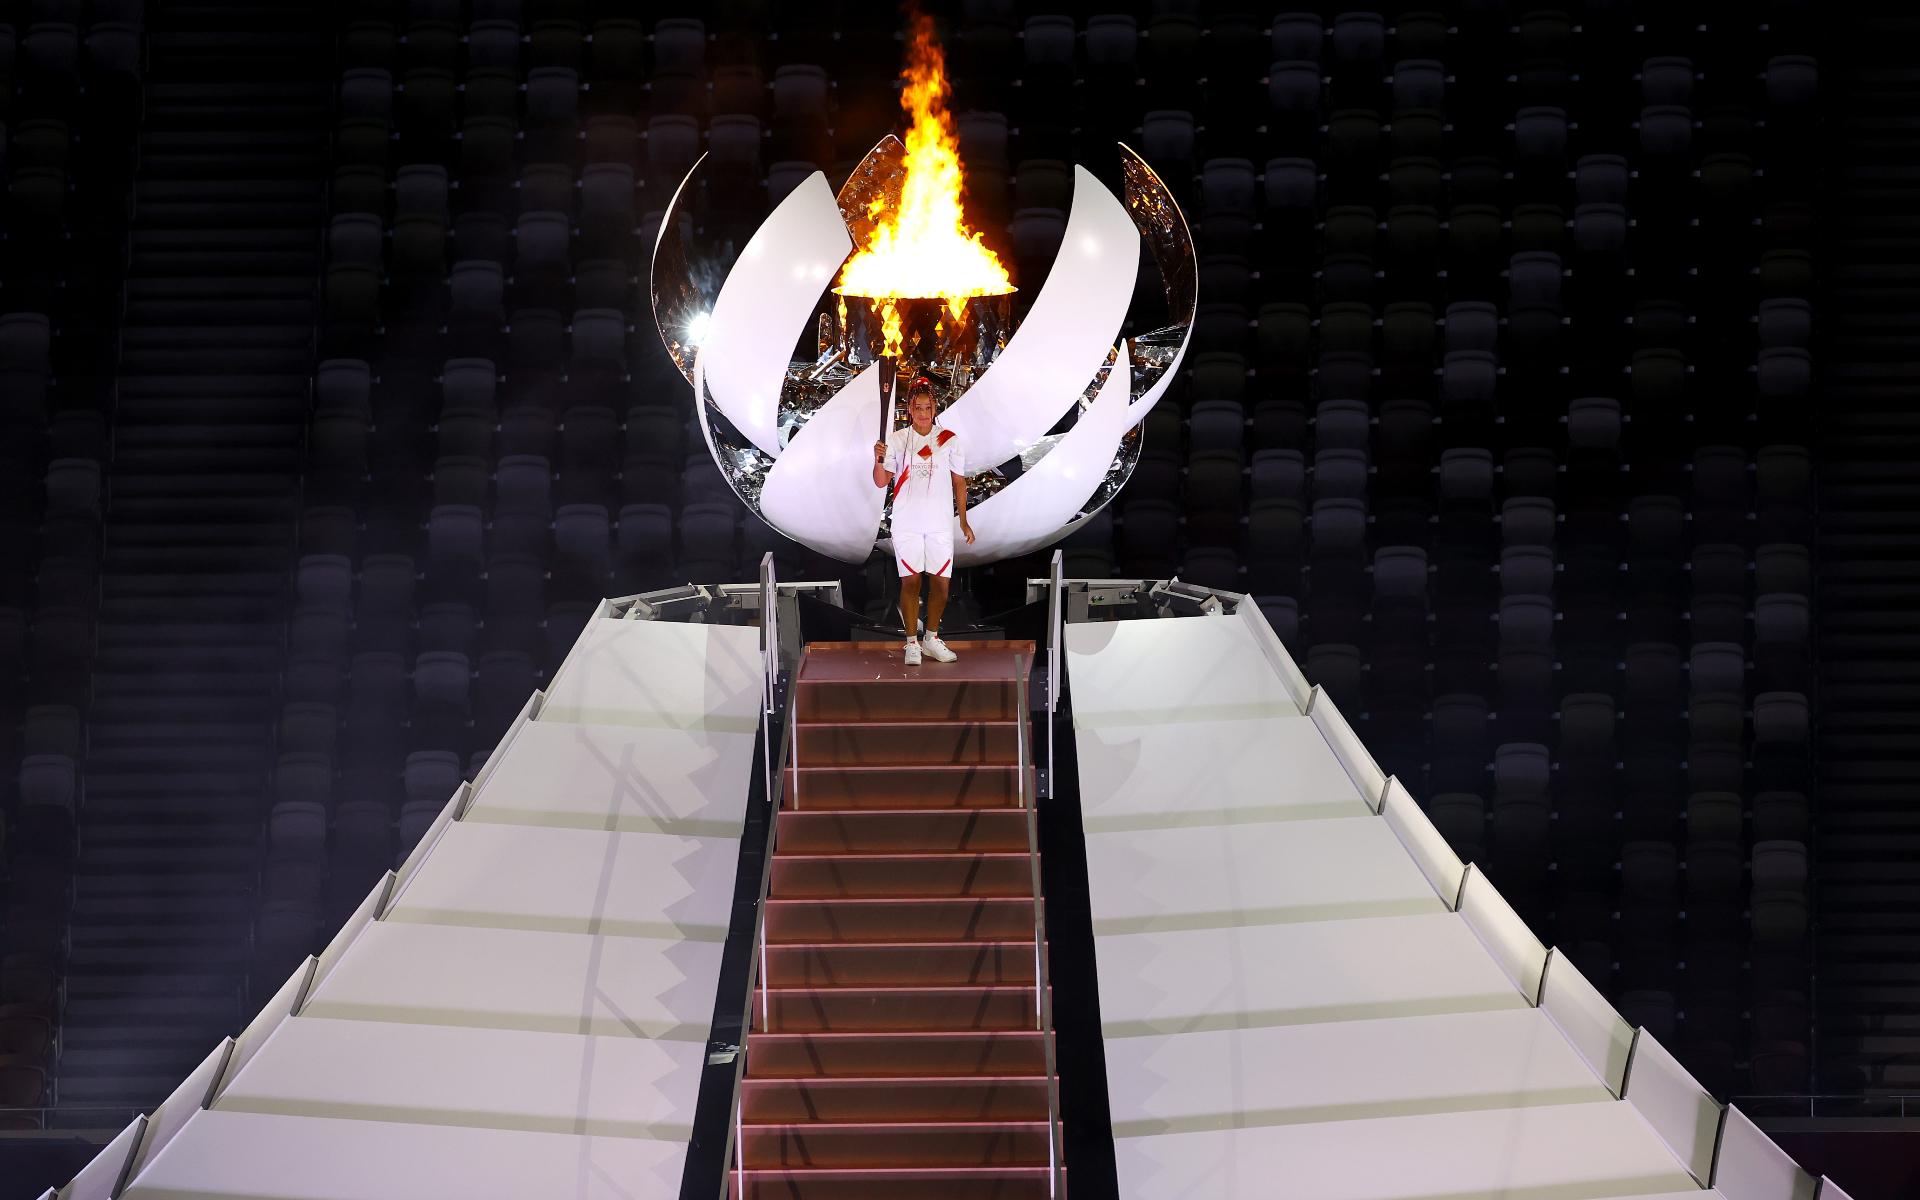 Фото: Наоми Осака и олимпийский огонь (Getty Images)